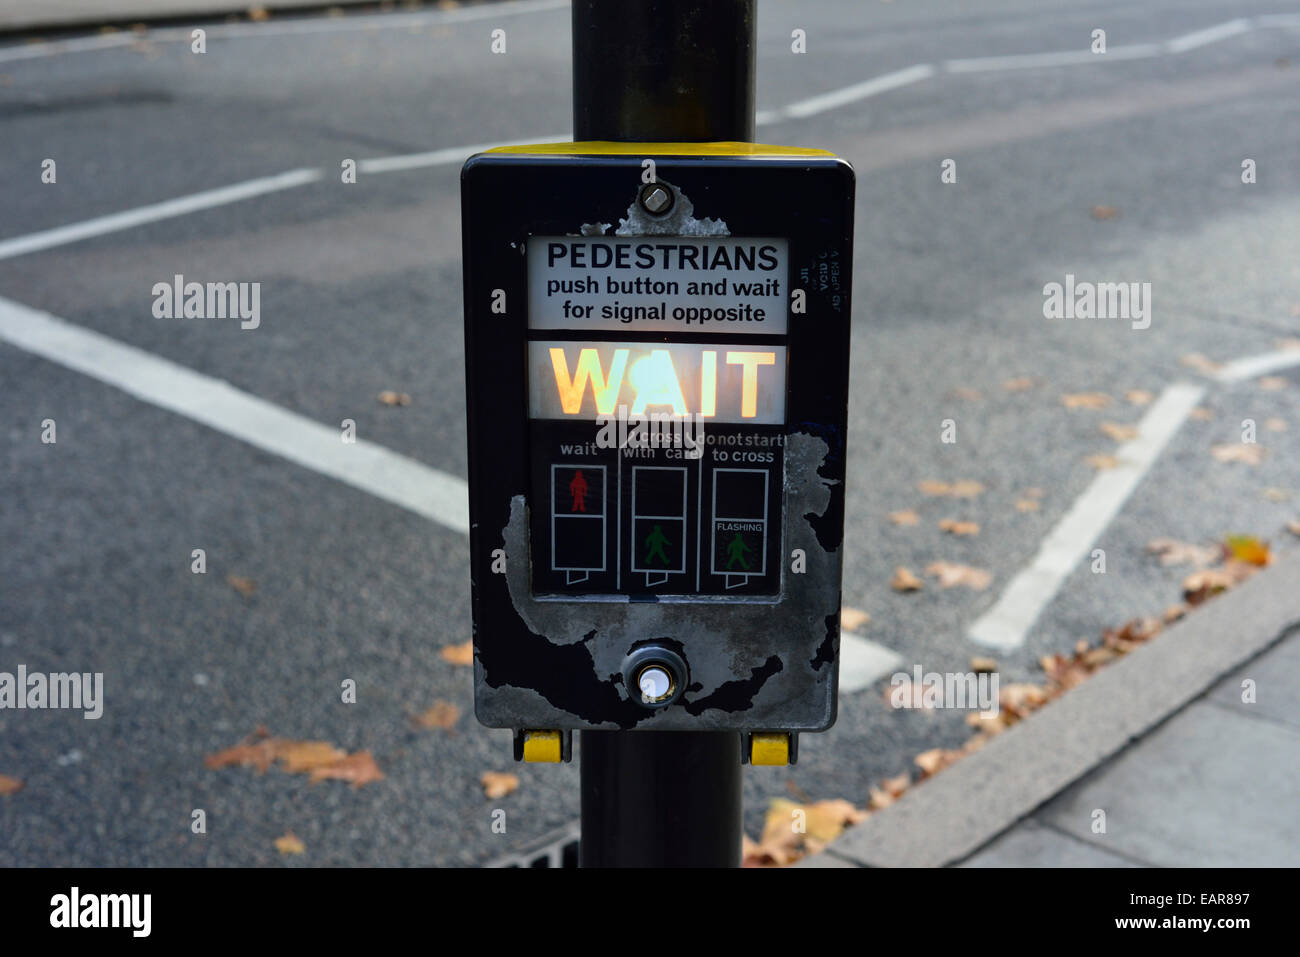 Worn Pelican crossing illuminated control panel, central